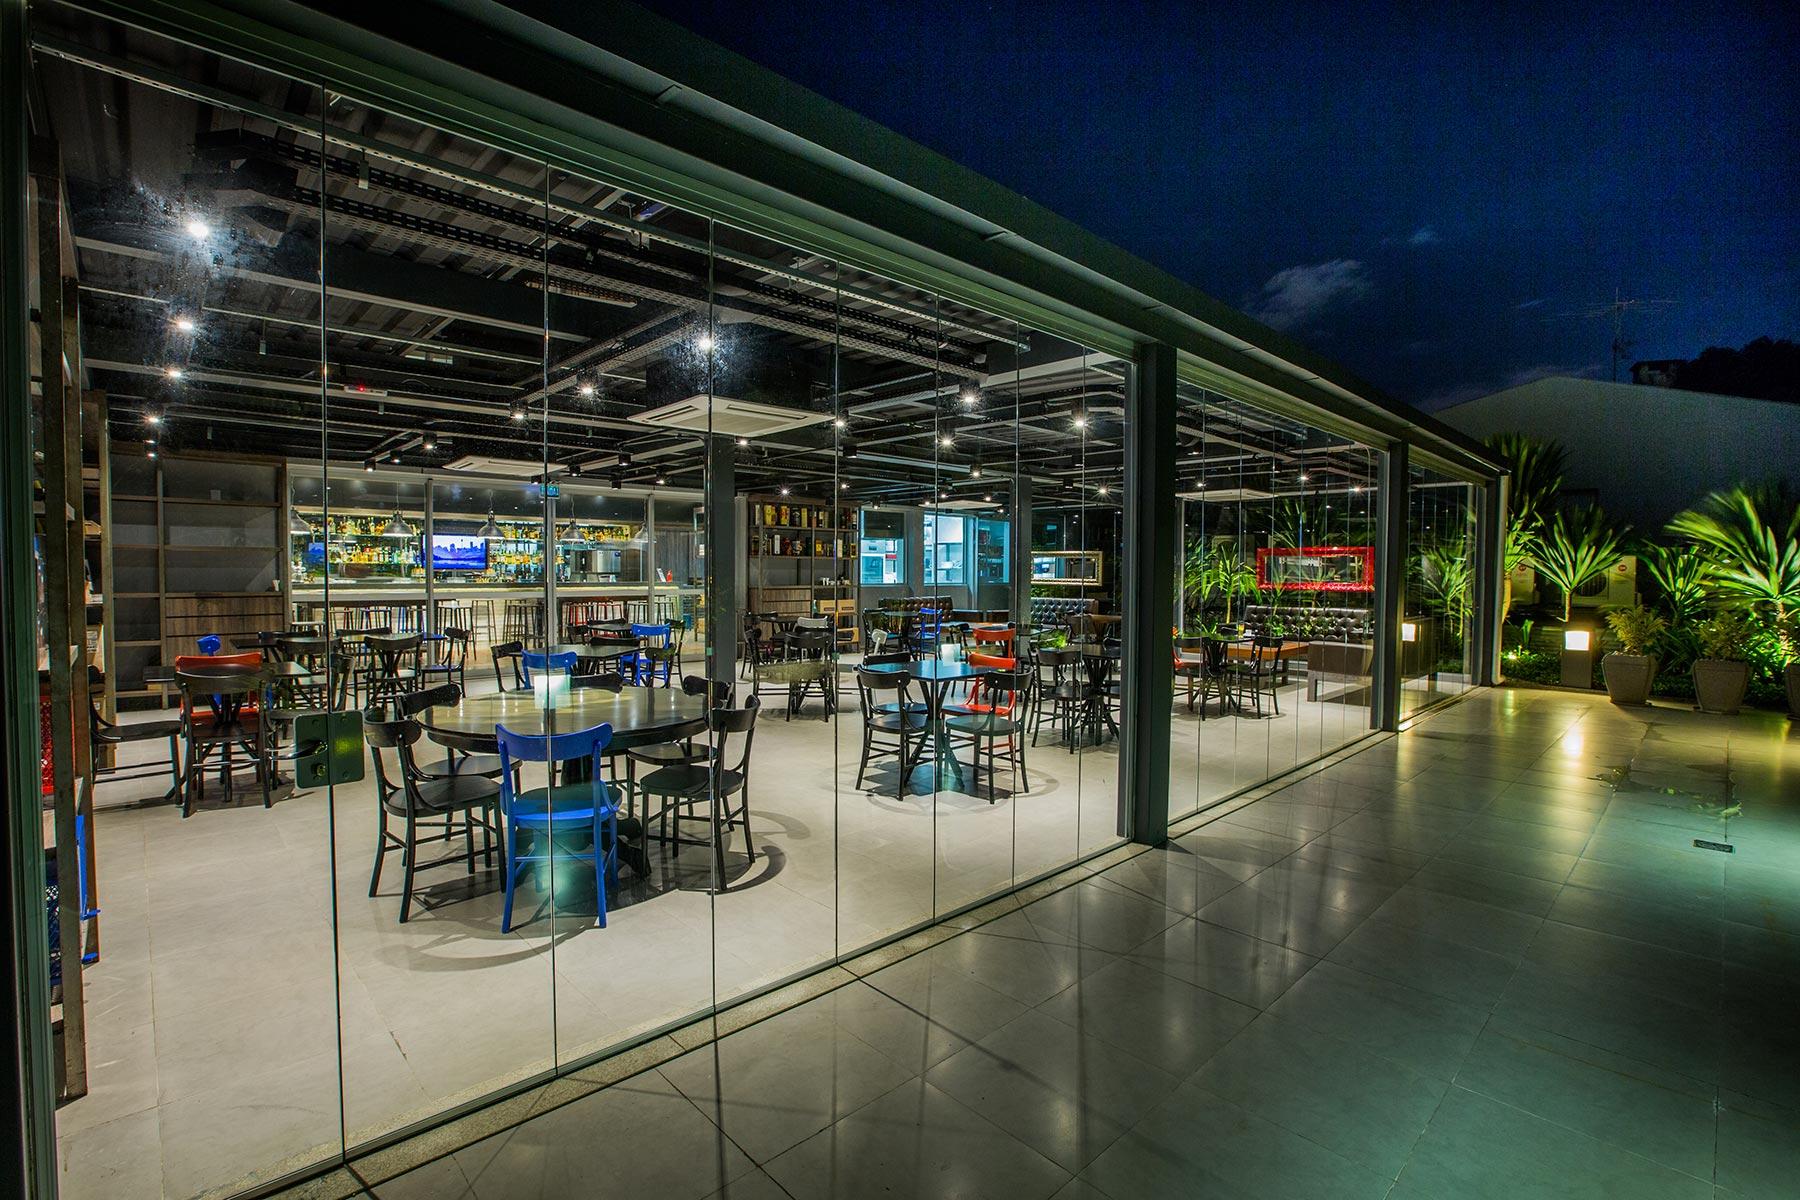 PPKB Kitchen Amp Bar Porto Alegre ChefsClub